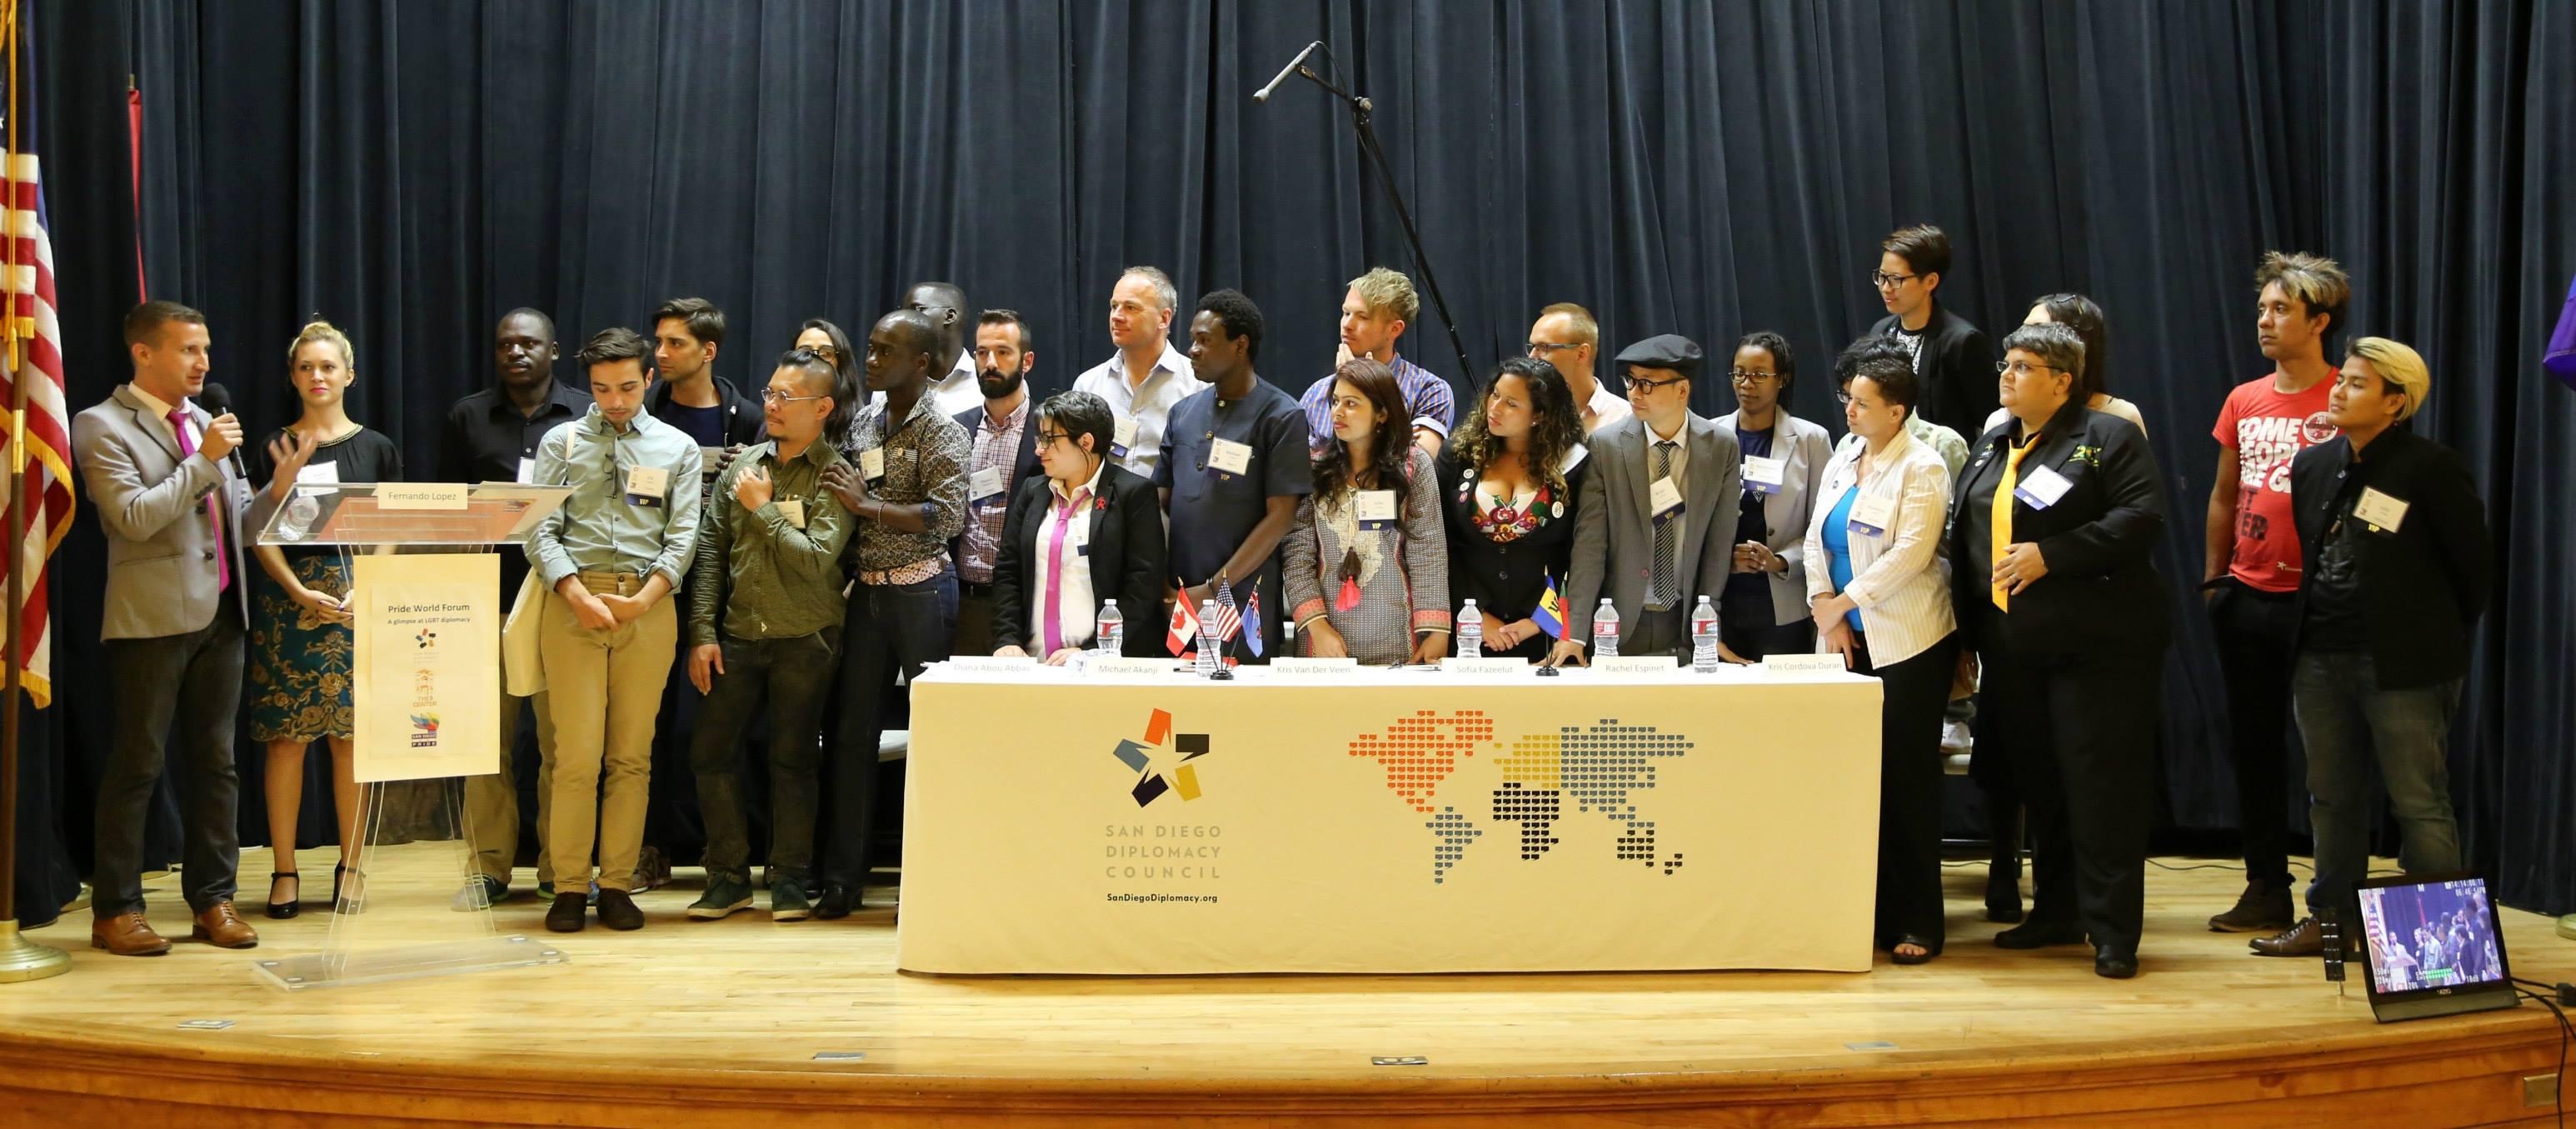 fernando-moderates-pride-world-forum-2015